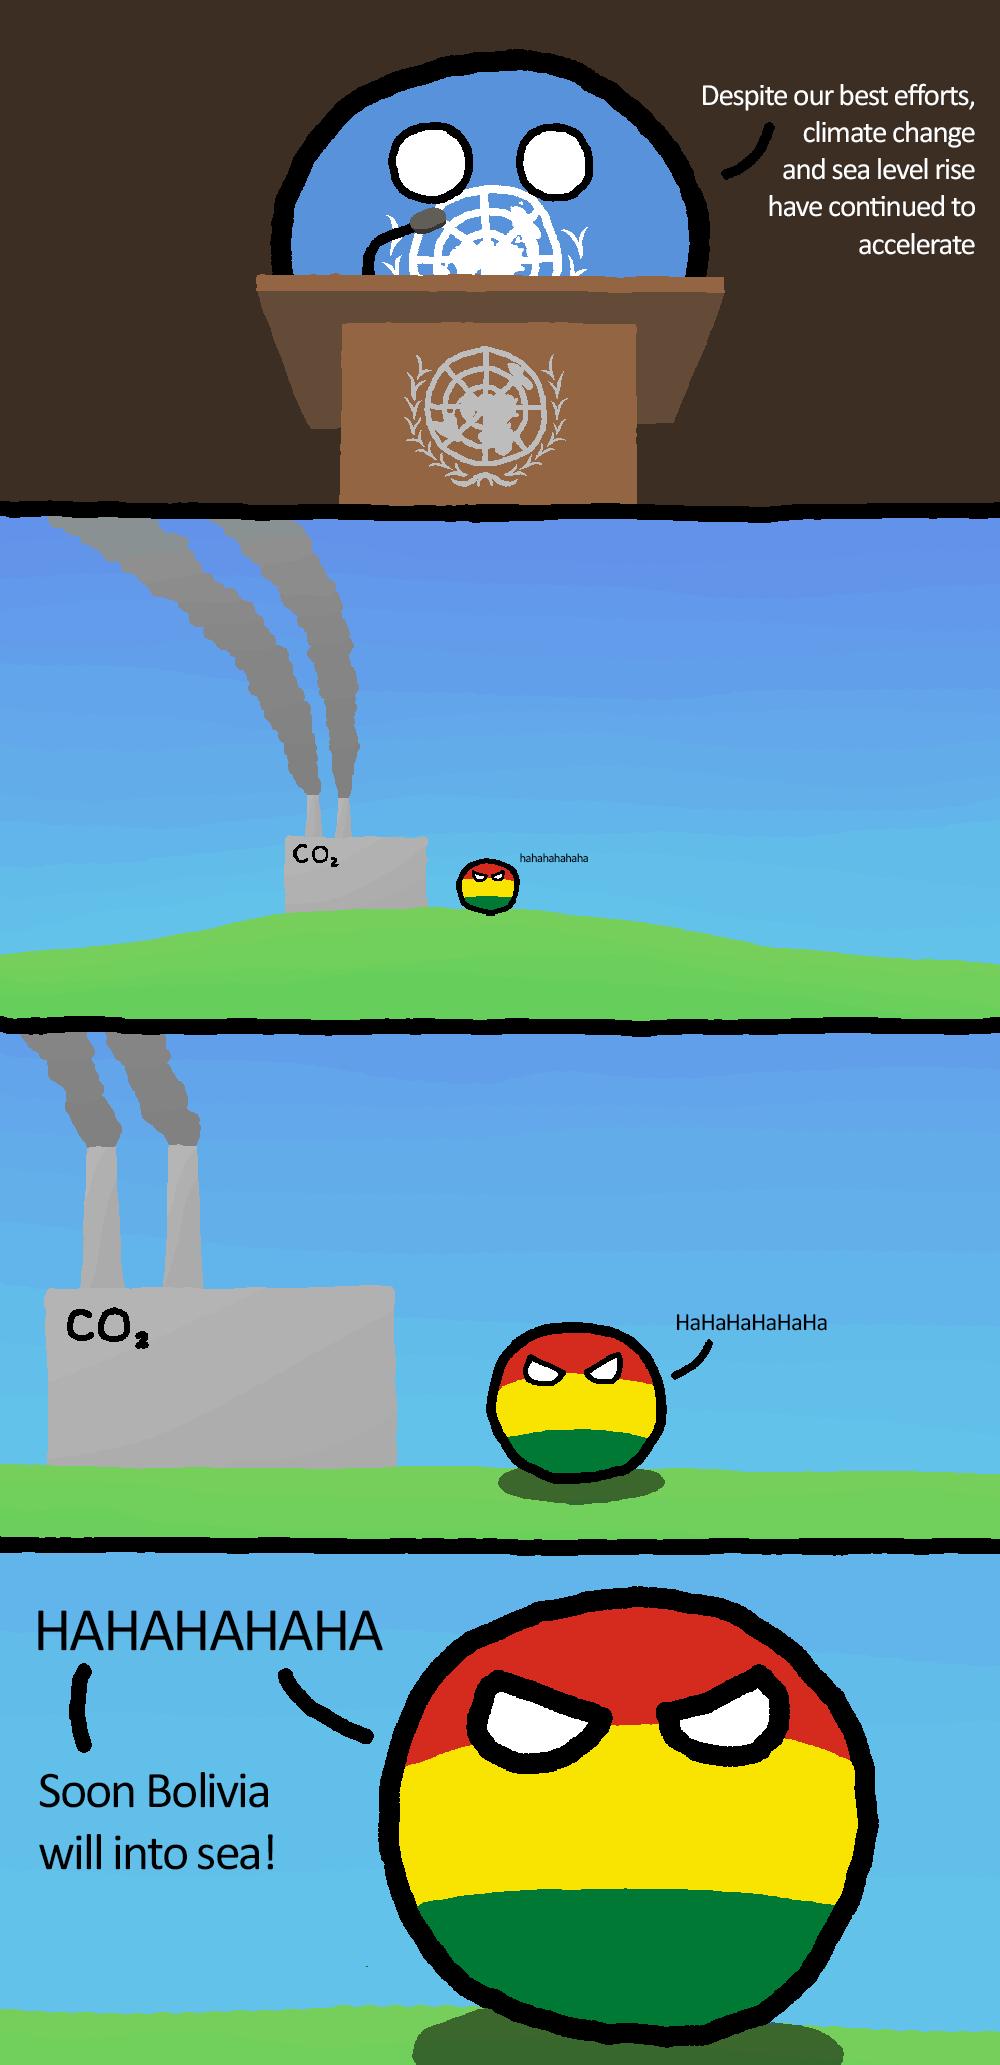 Bolivia can finally into sea